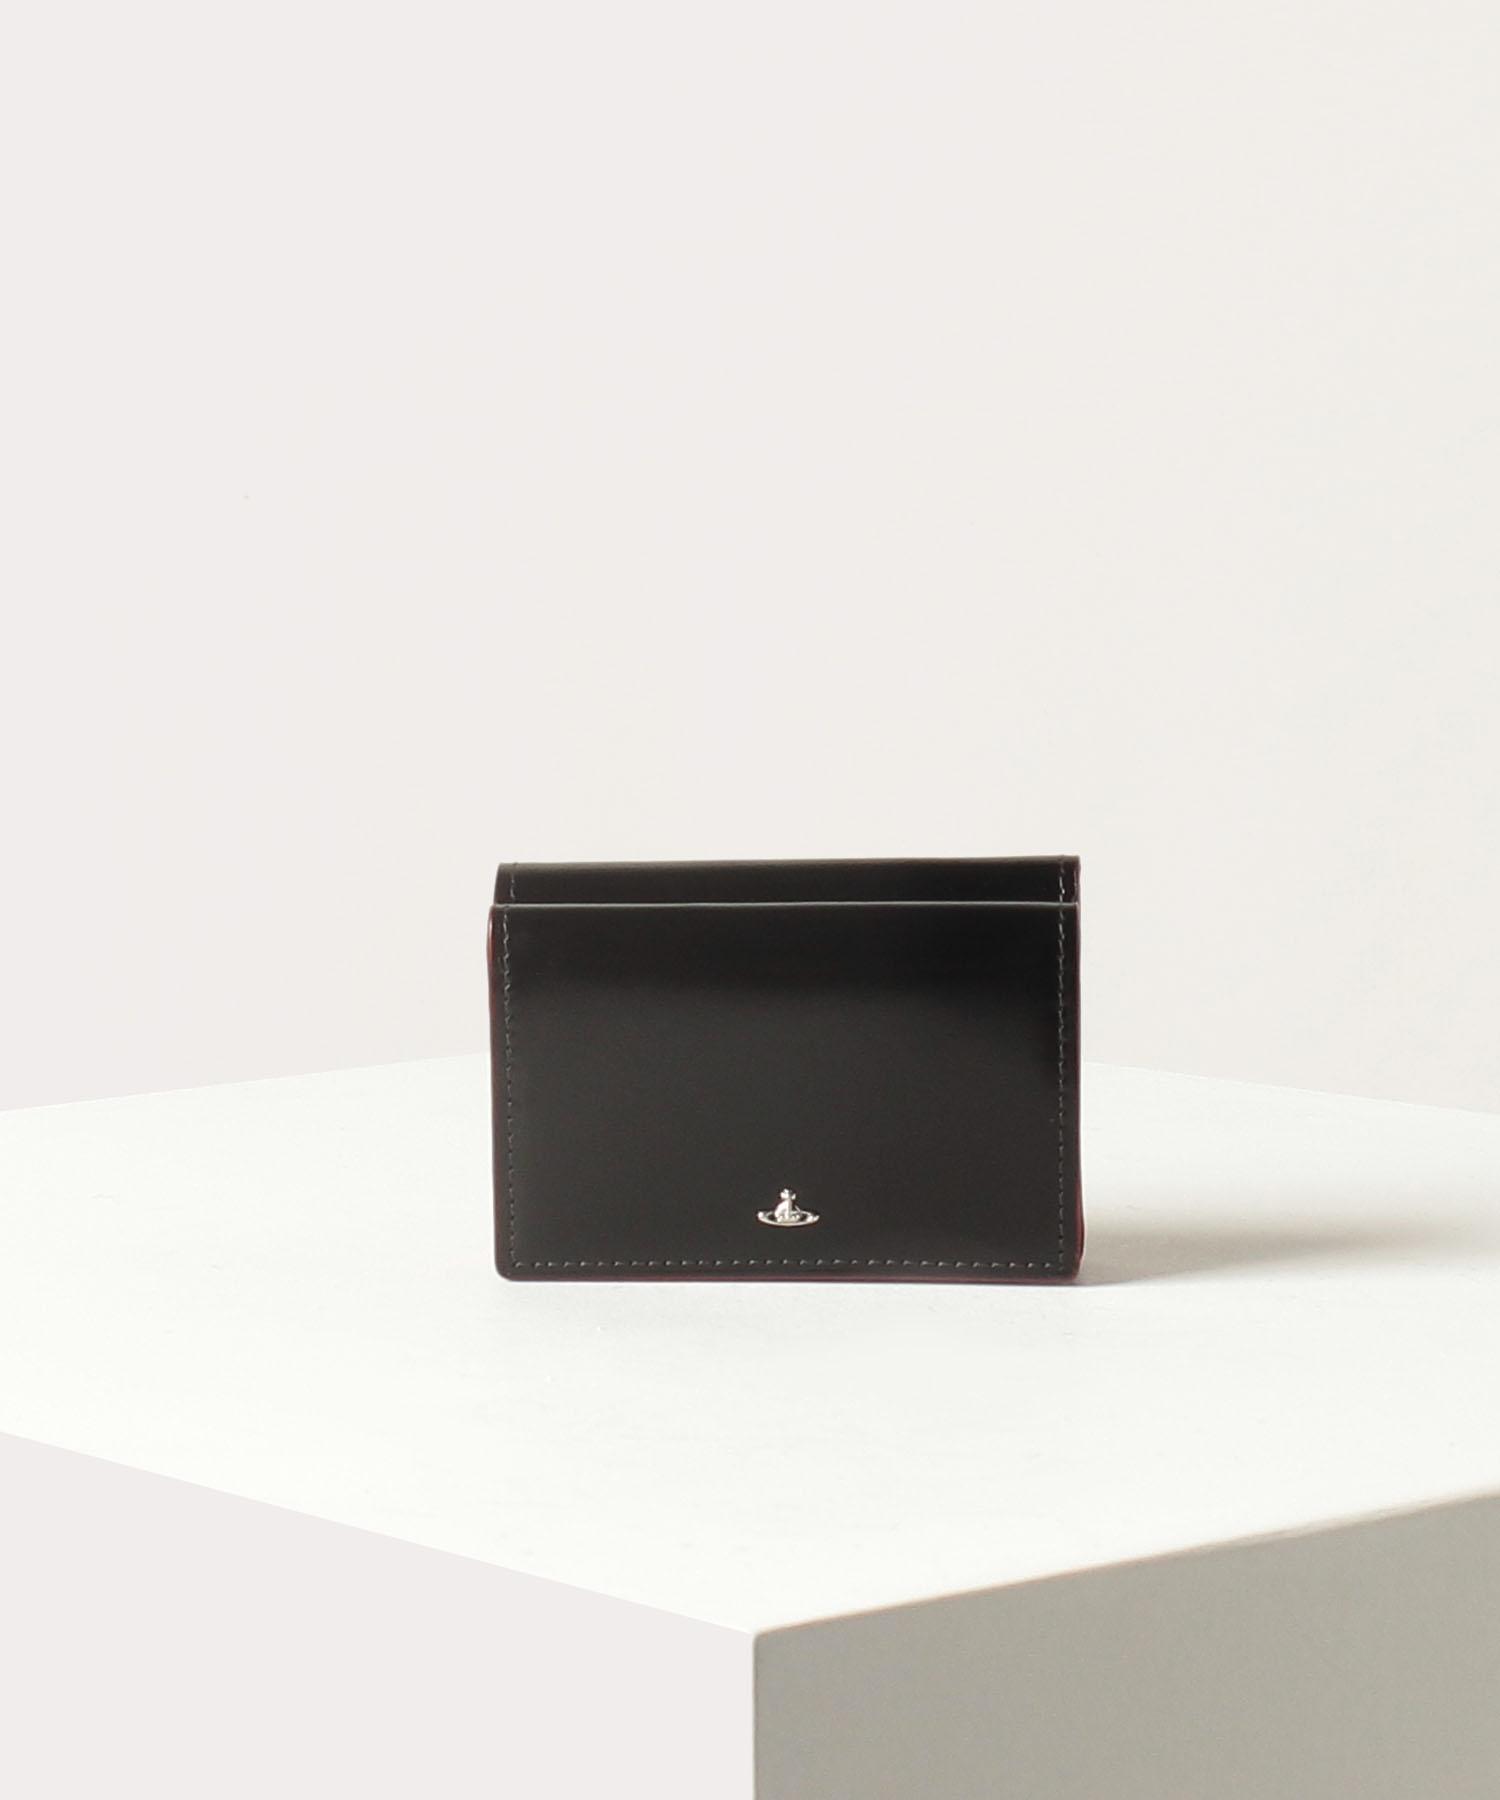 SIMPLE TINY ORB 三つ折りミニ財布